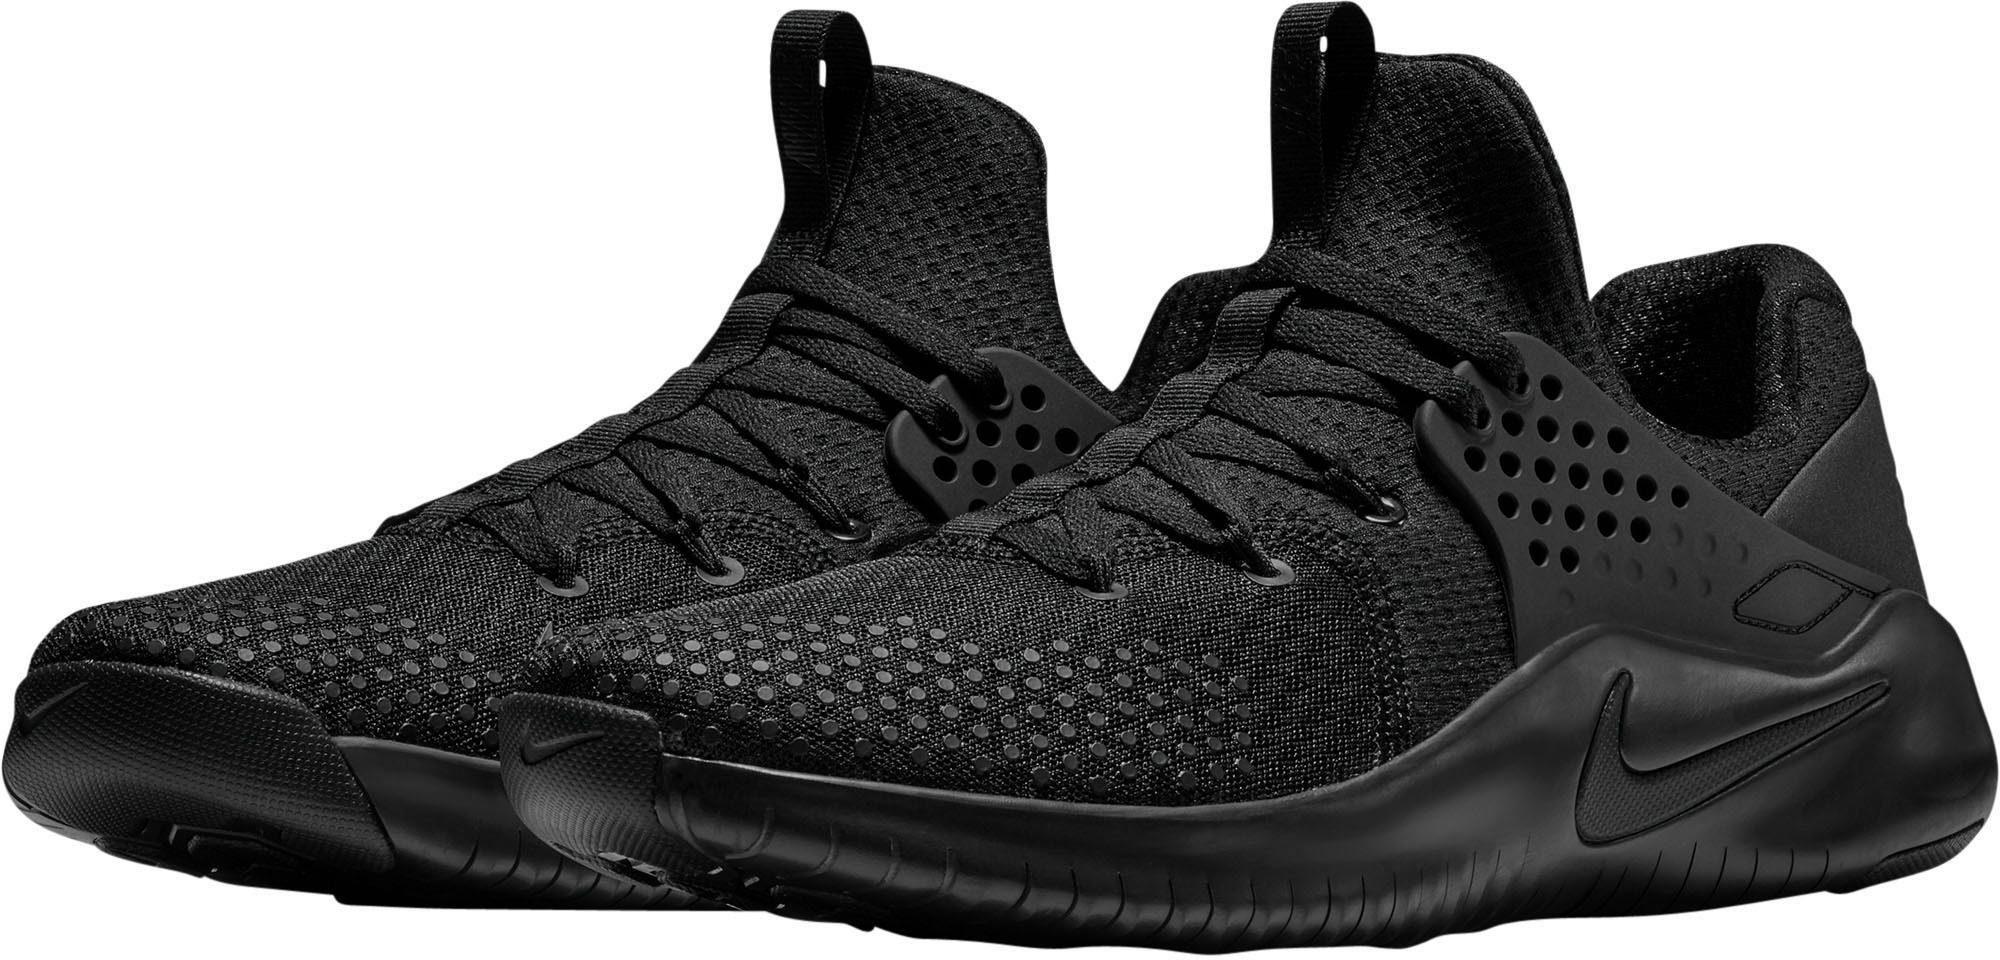 Nike »Free TR V8« Trainingsschuh, Atmungsaktives Obermaterial aus Mesh und Synthetik online kaufen | OTTO